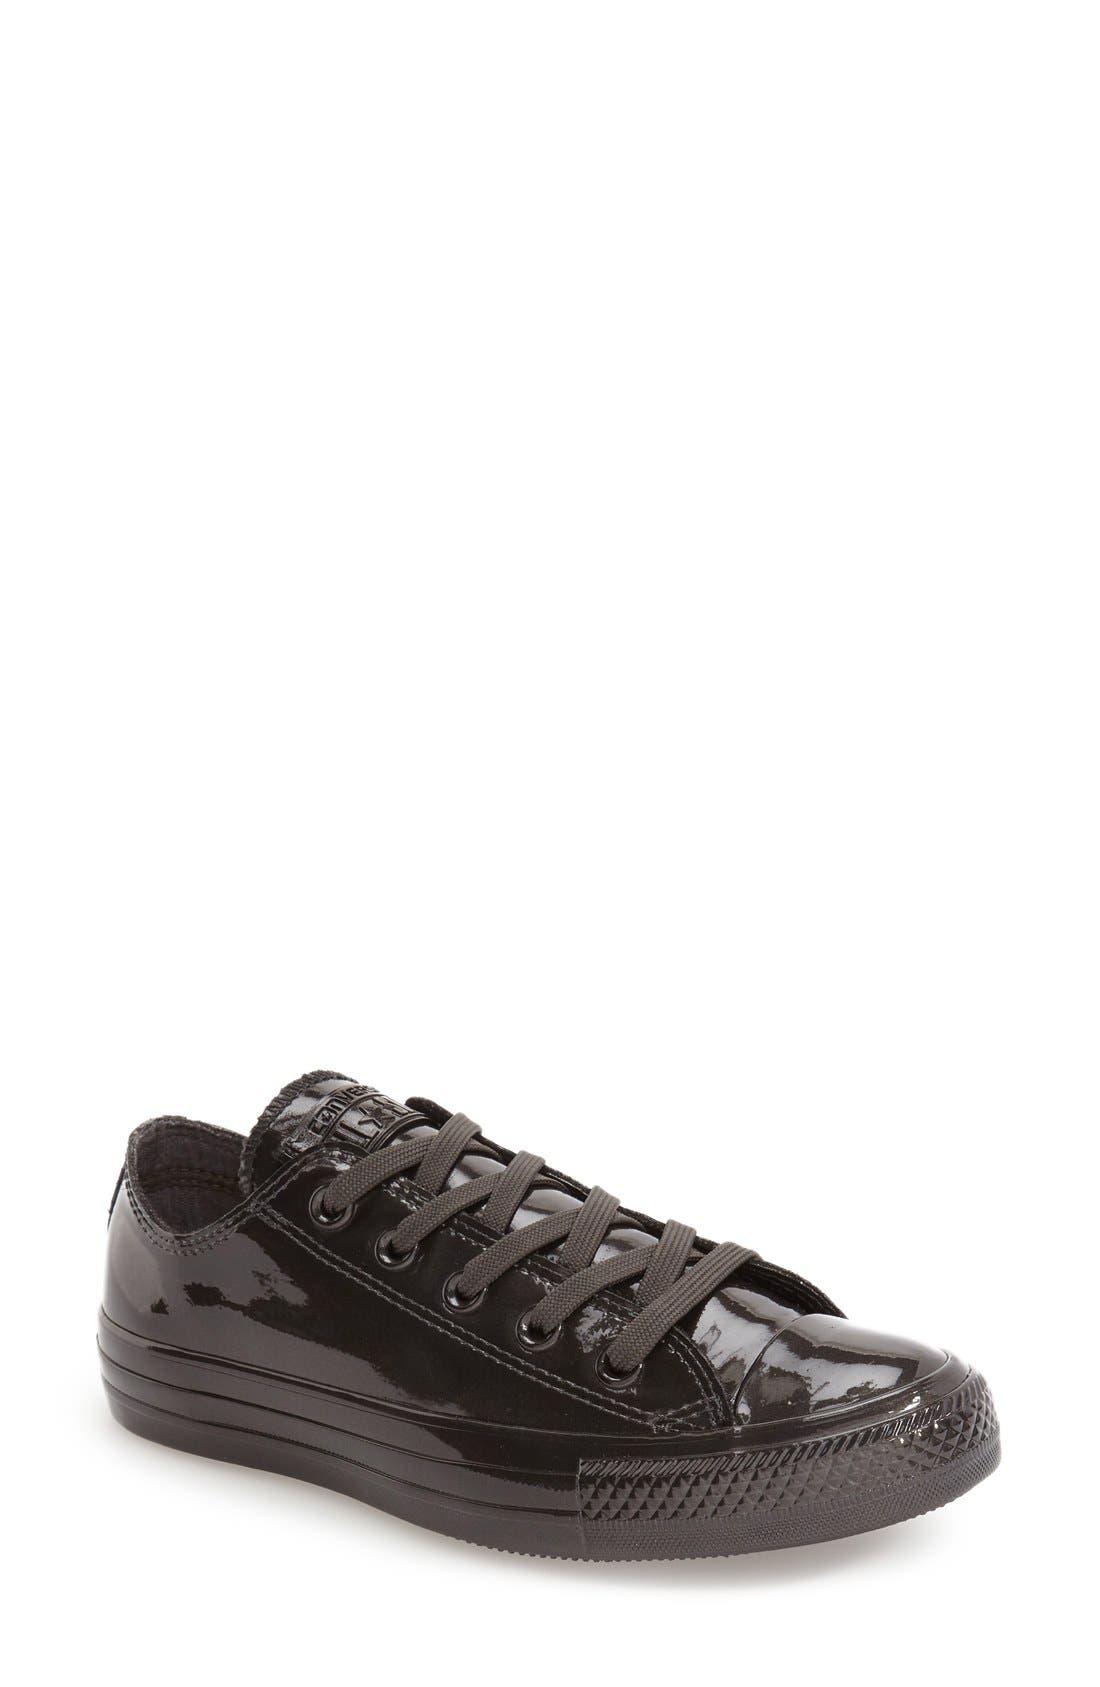 Main Image - Converse Chuck Taylor® All Star® Metallic Water Repellent Low Top Sneaker (Women)